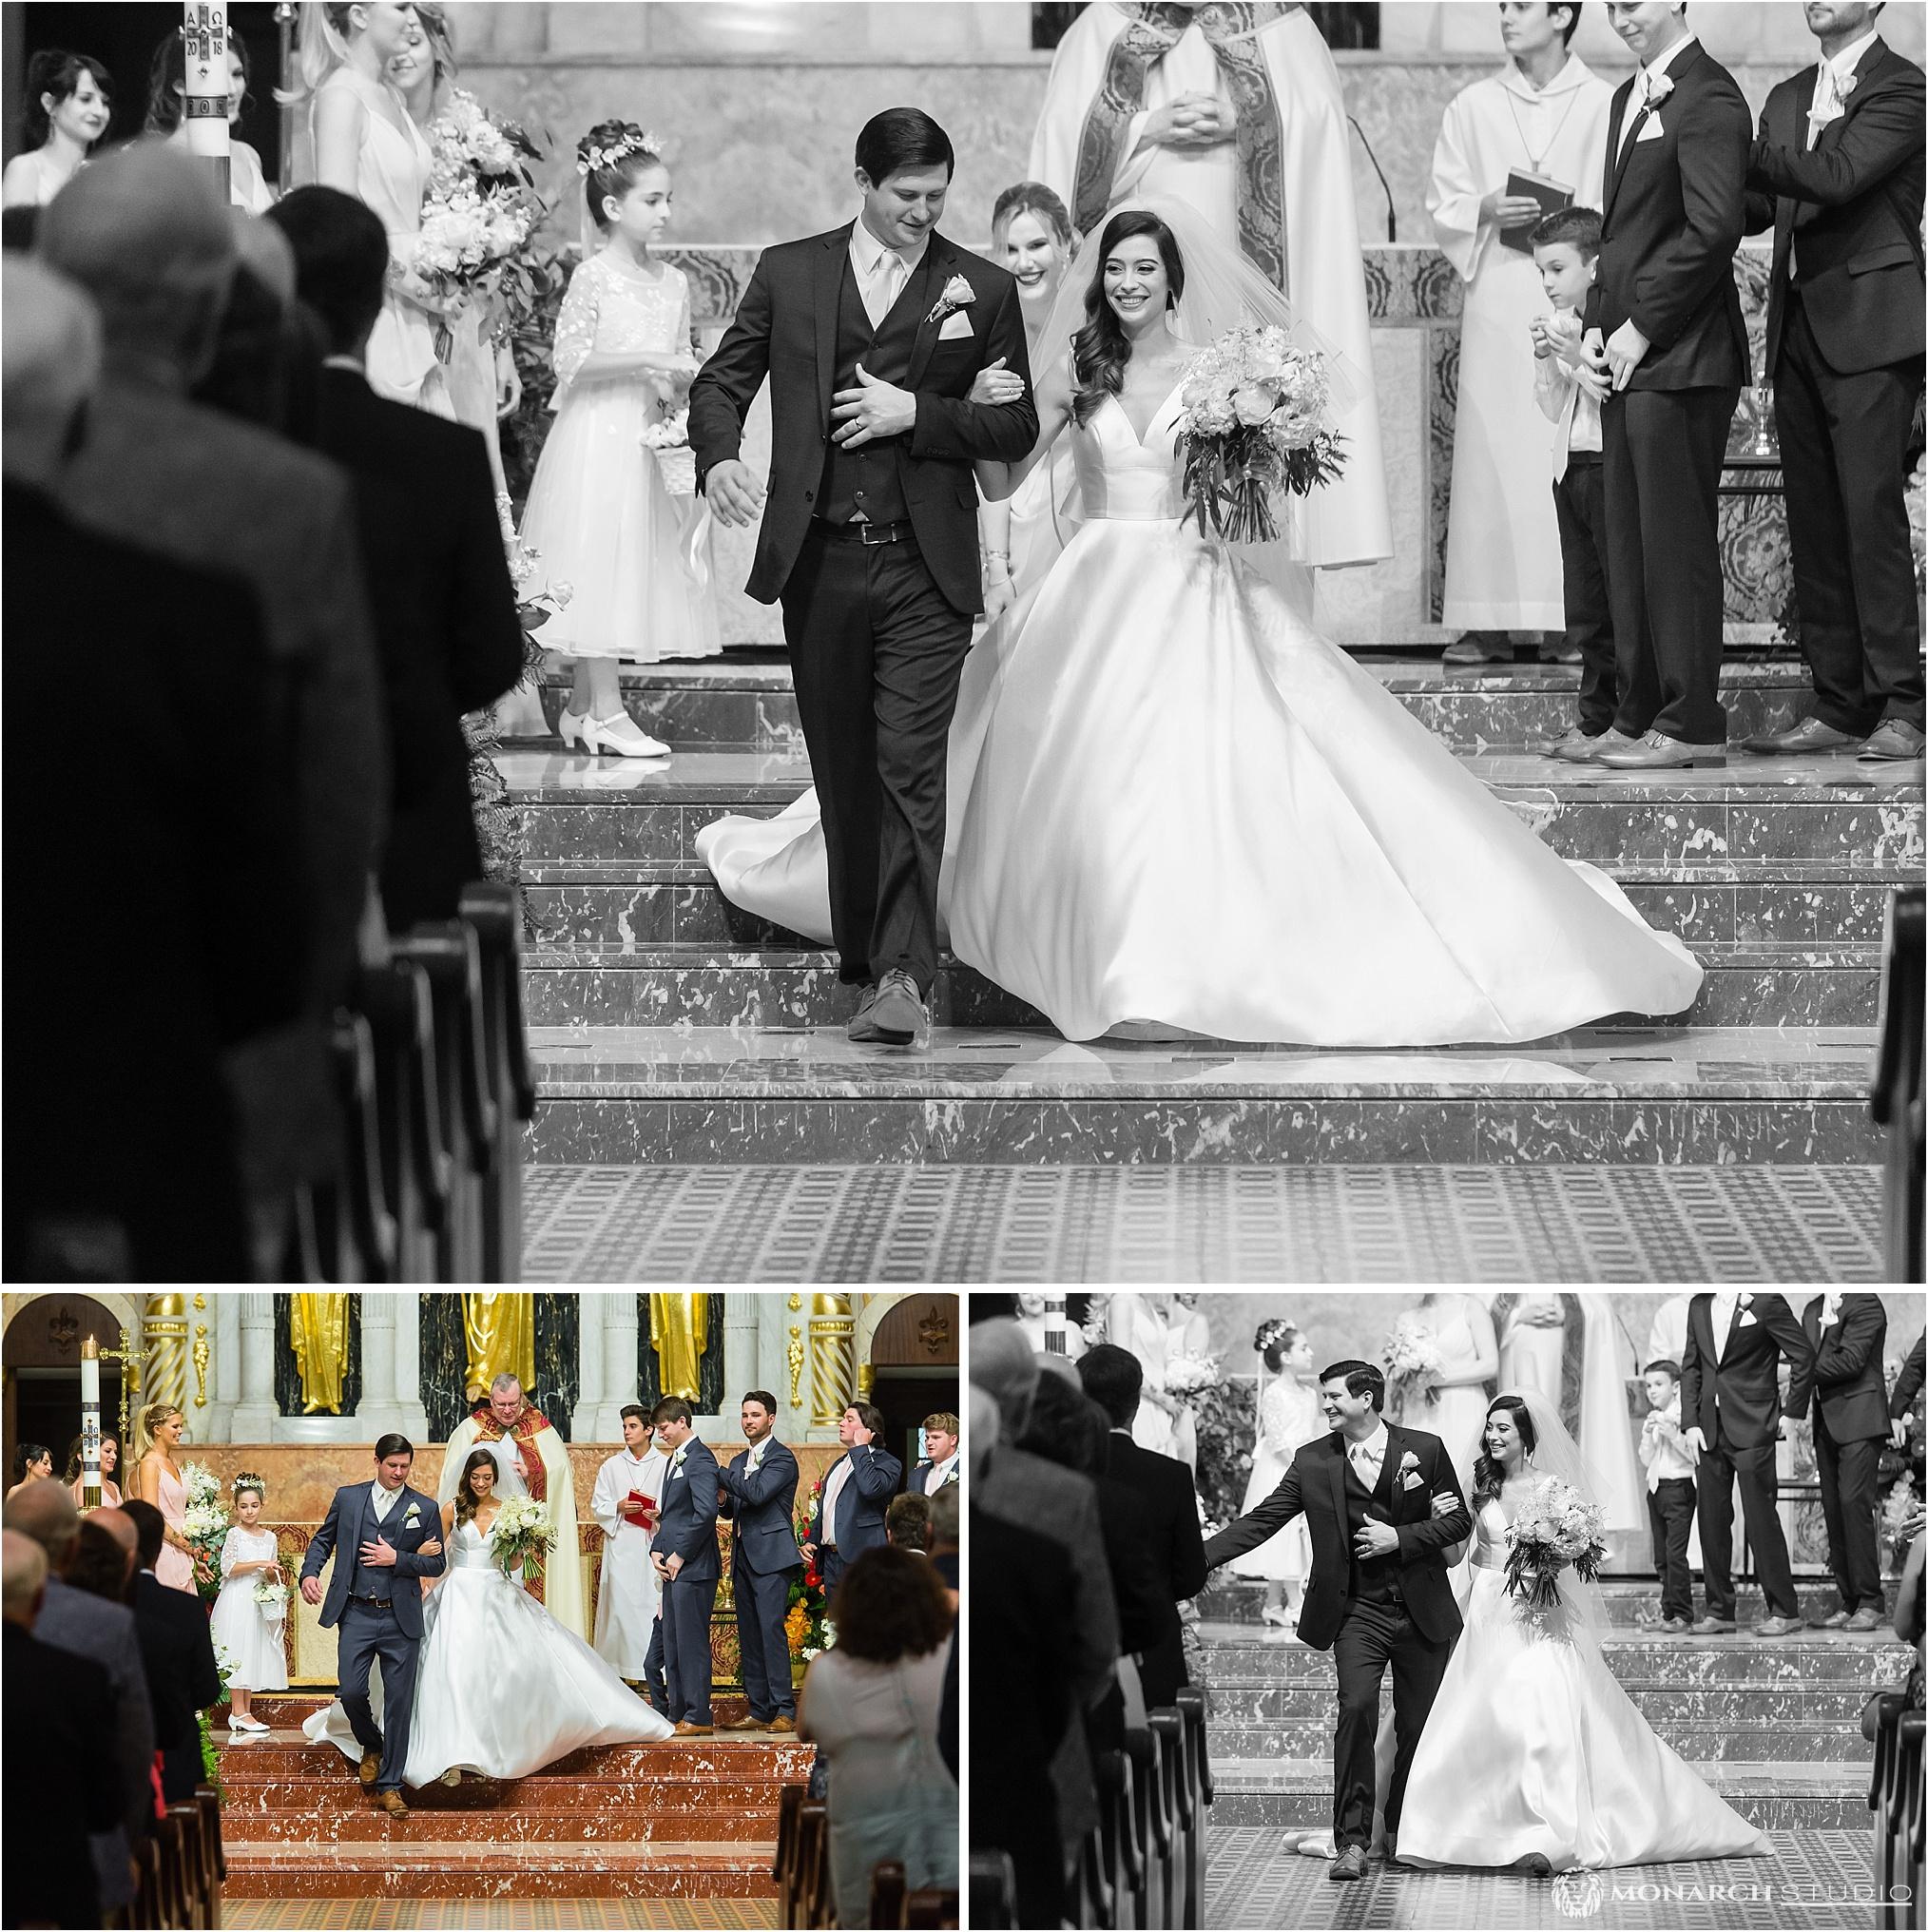 st-augustine-wedding-photographer-074.jpg